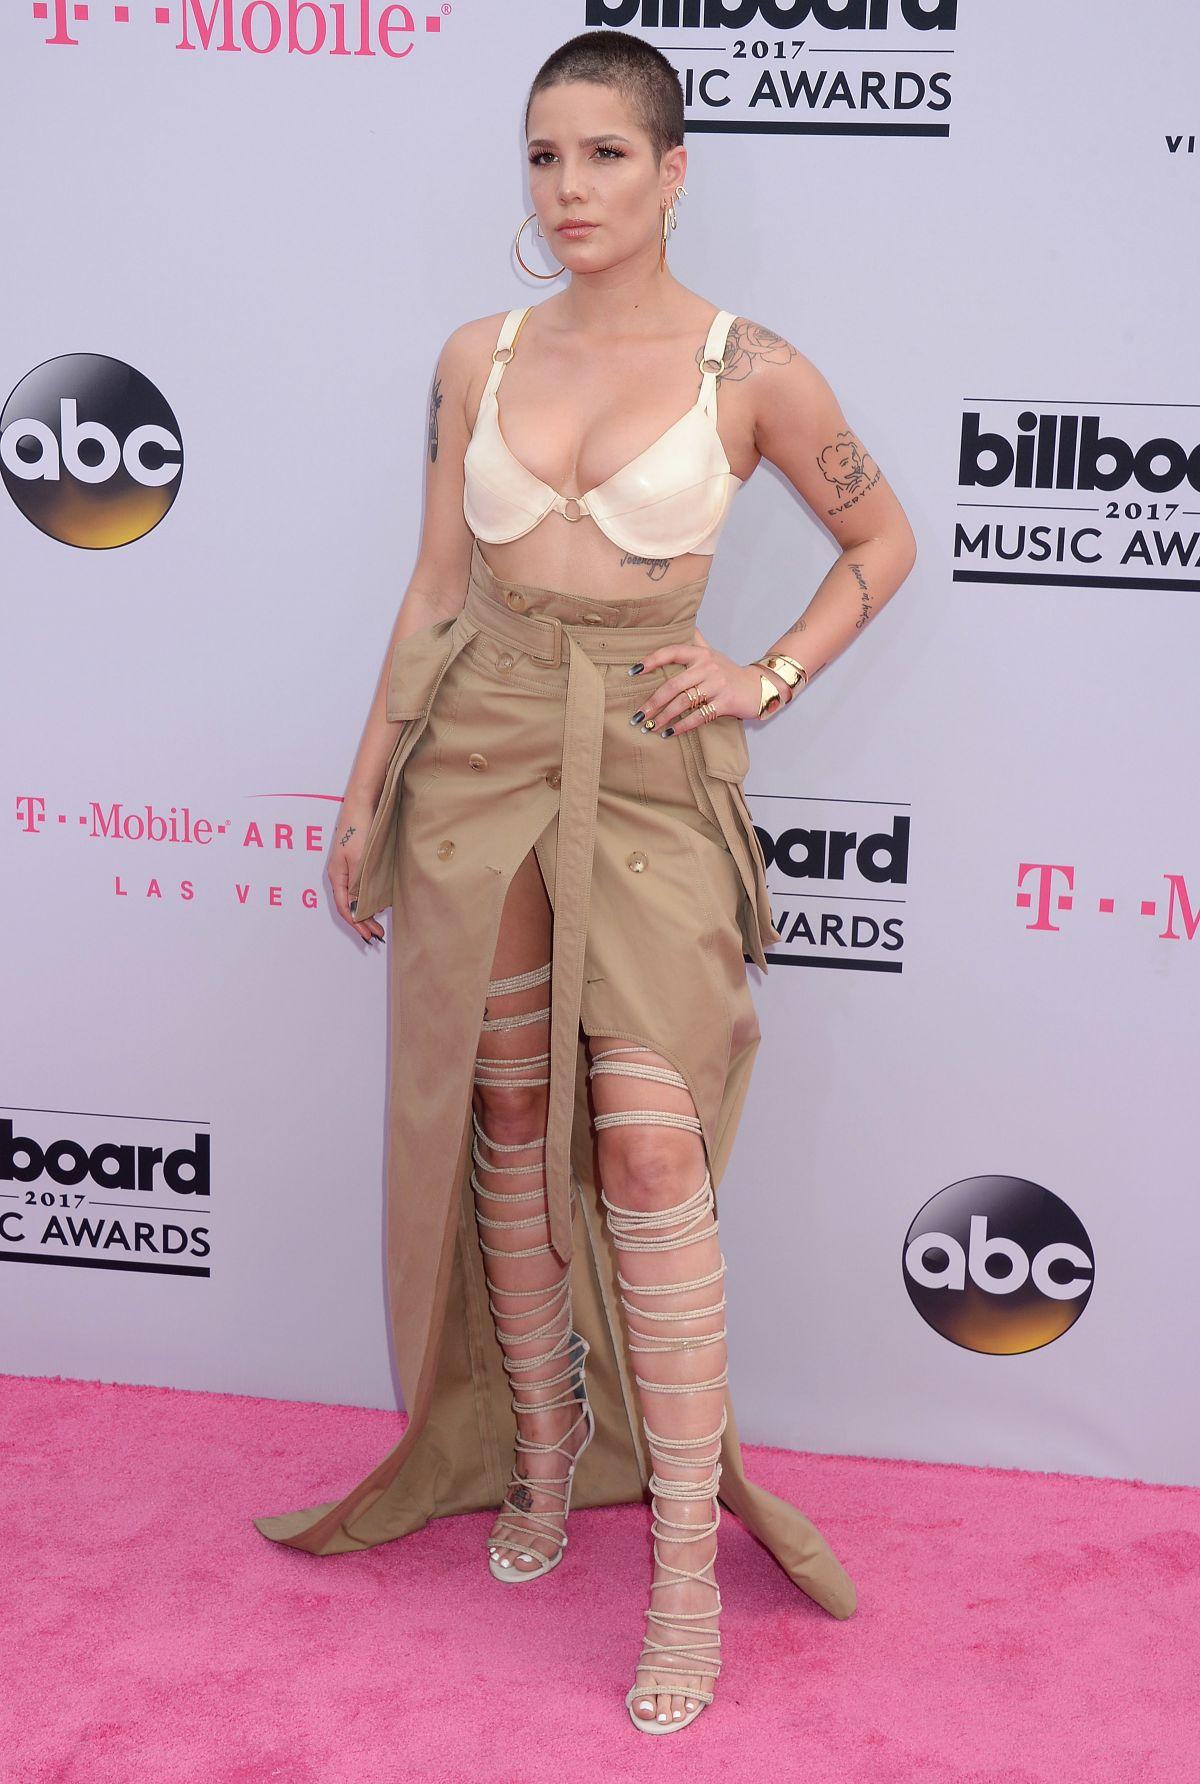 HALSEY at Billboard Music Awards 2017 in Las Vegas 05/21/2017 - HawtCelebs